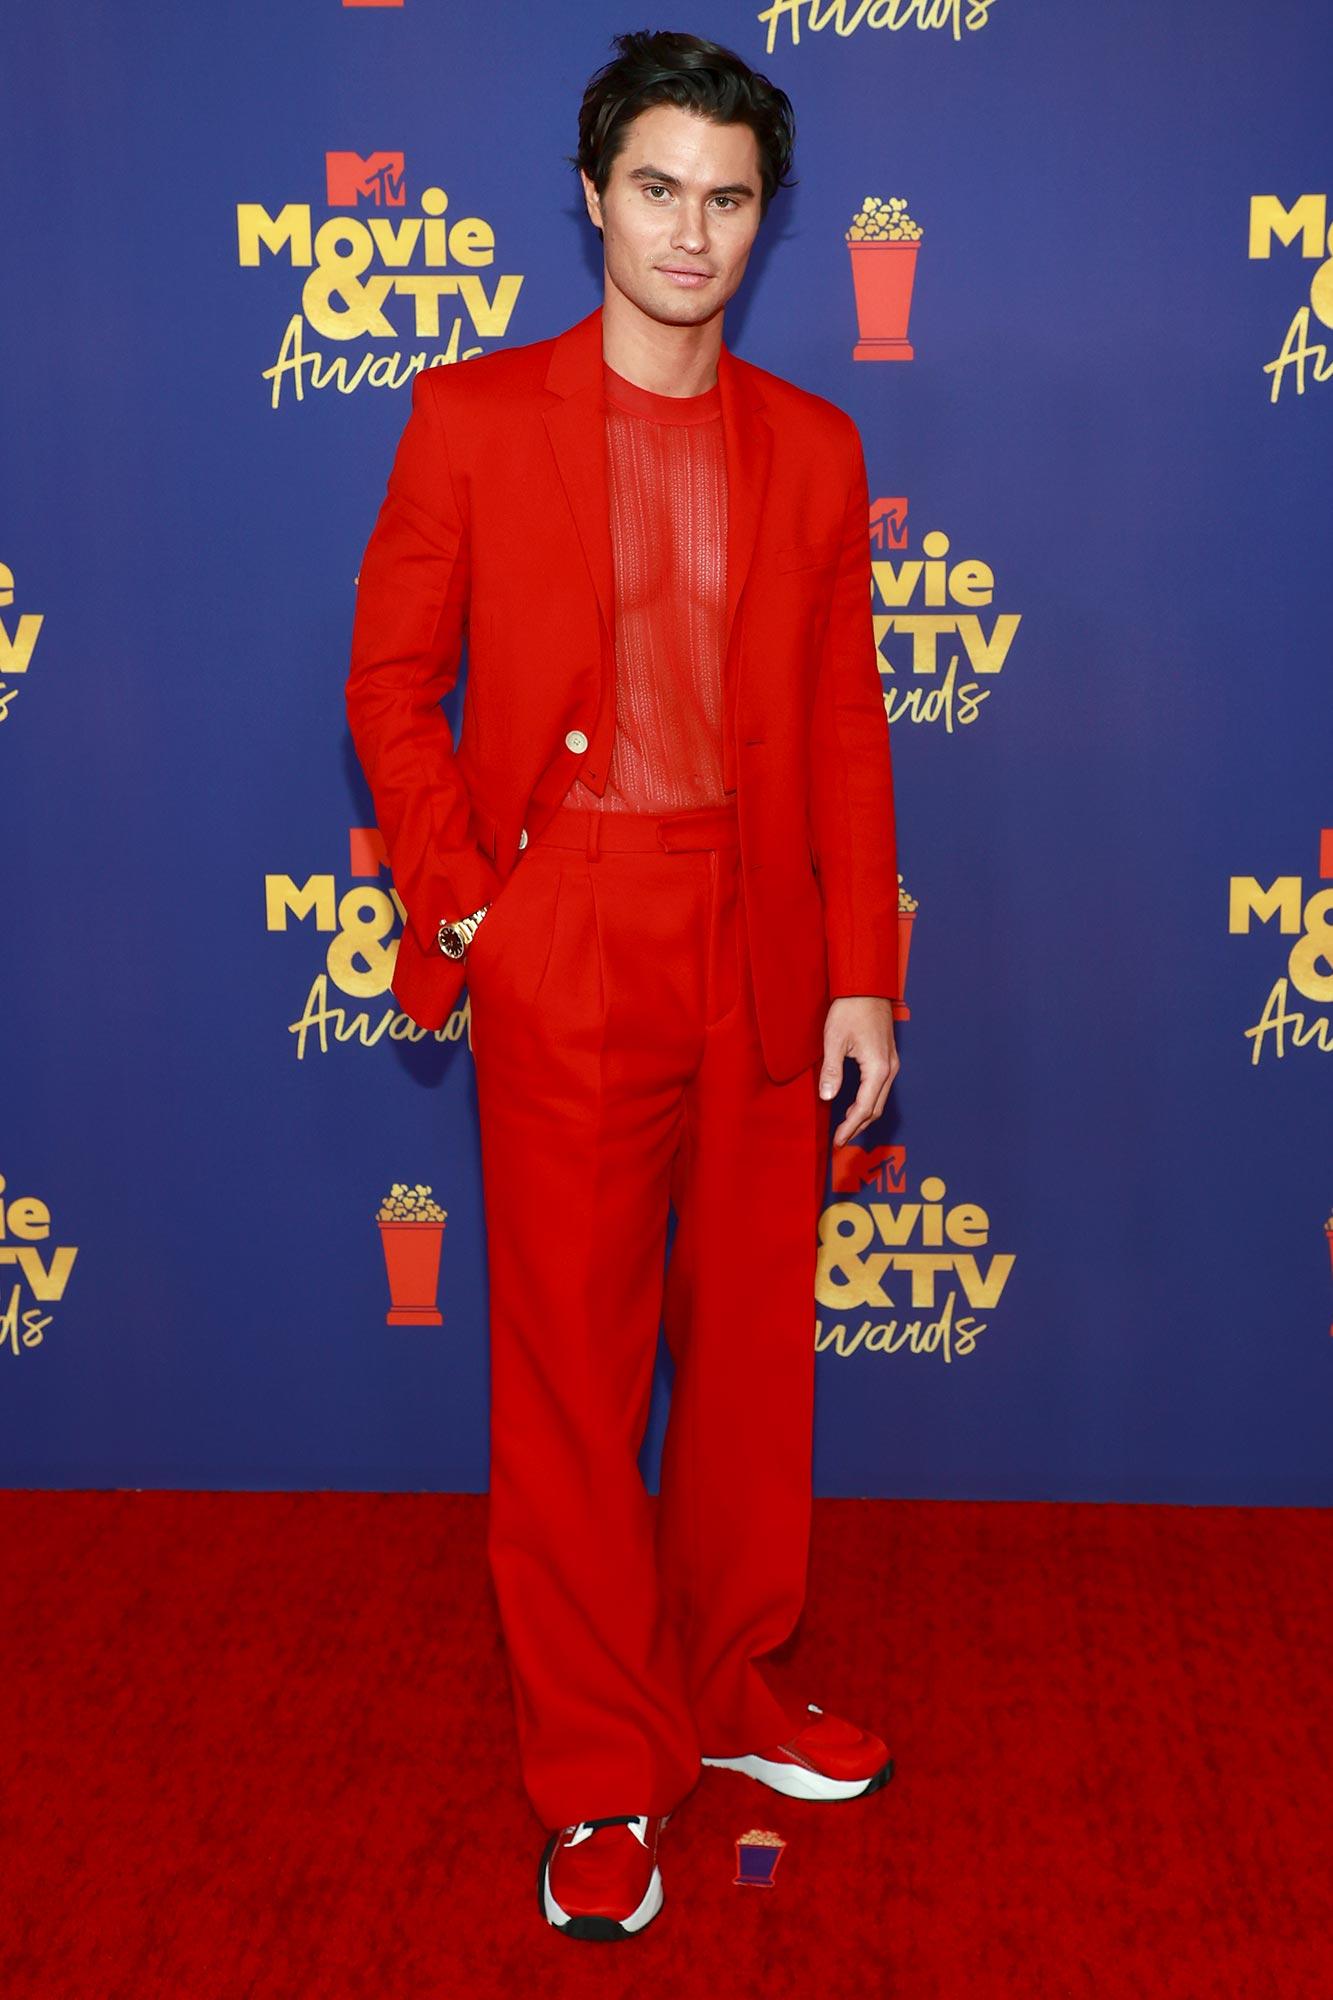 MTV Movie & TV Awards Chase Stokes